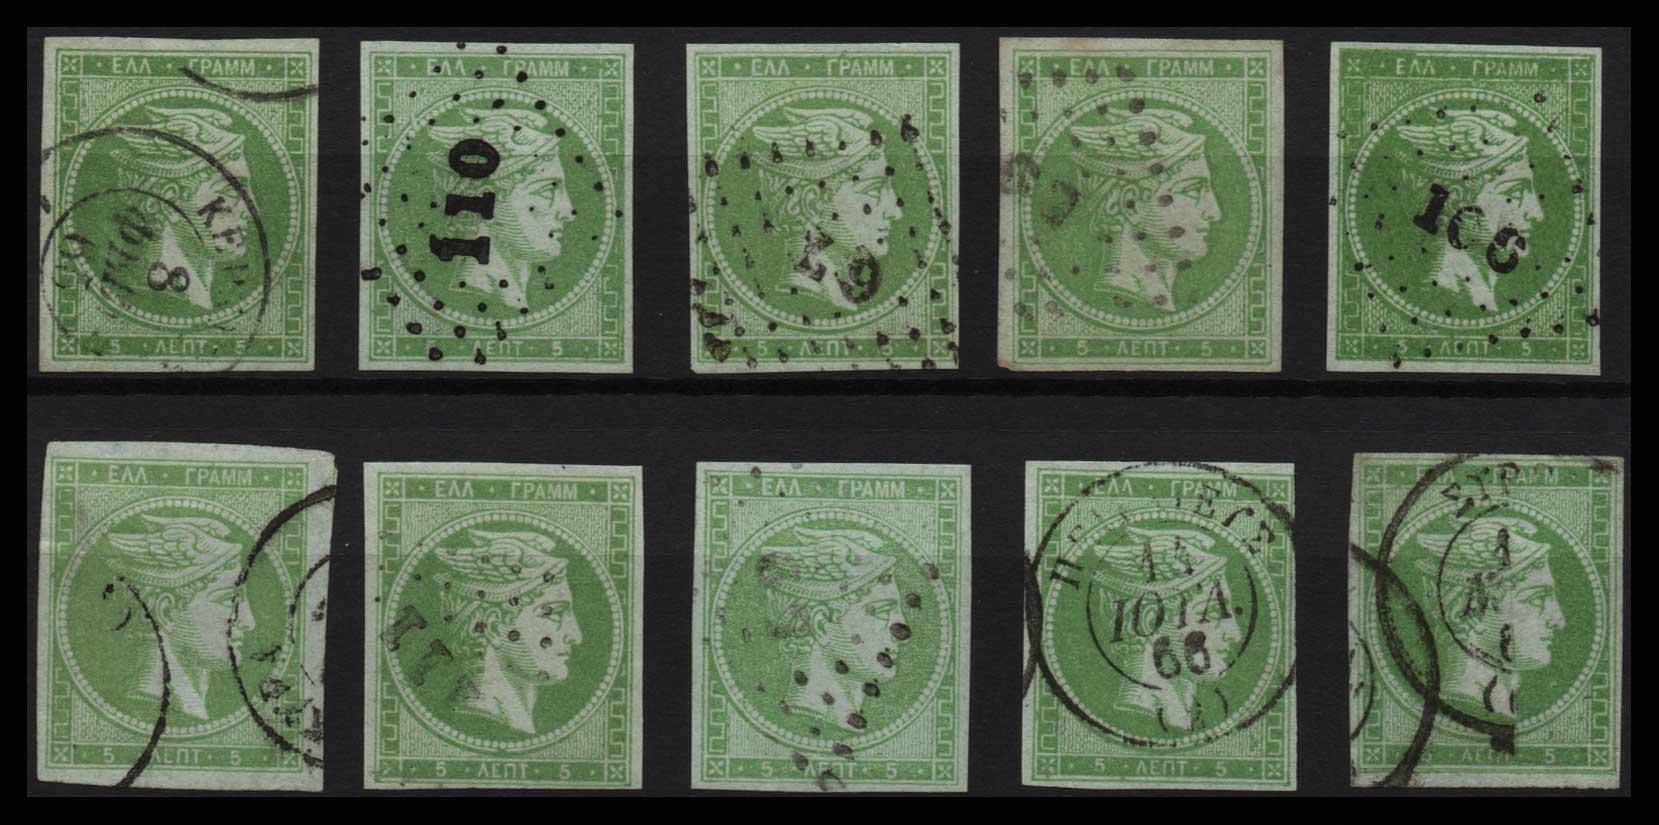 Lot 21 - -  LARGE HERMES HEAD large hermes head -  Athens Auctions Public Auction 82 General Stamp Sale